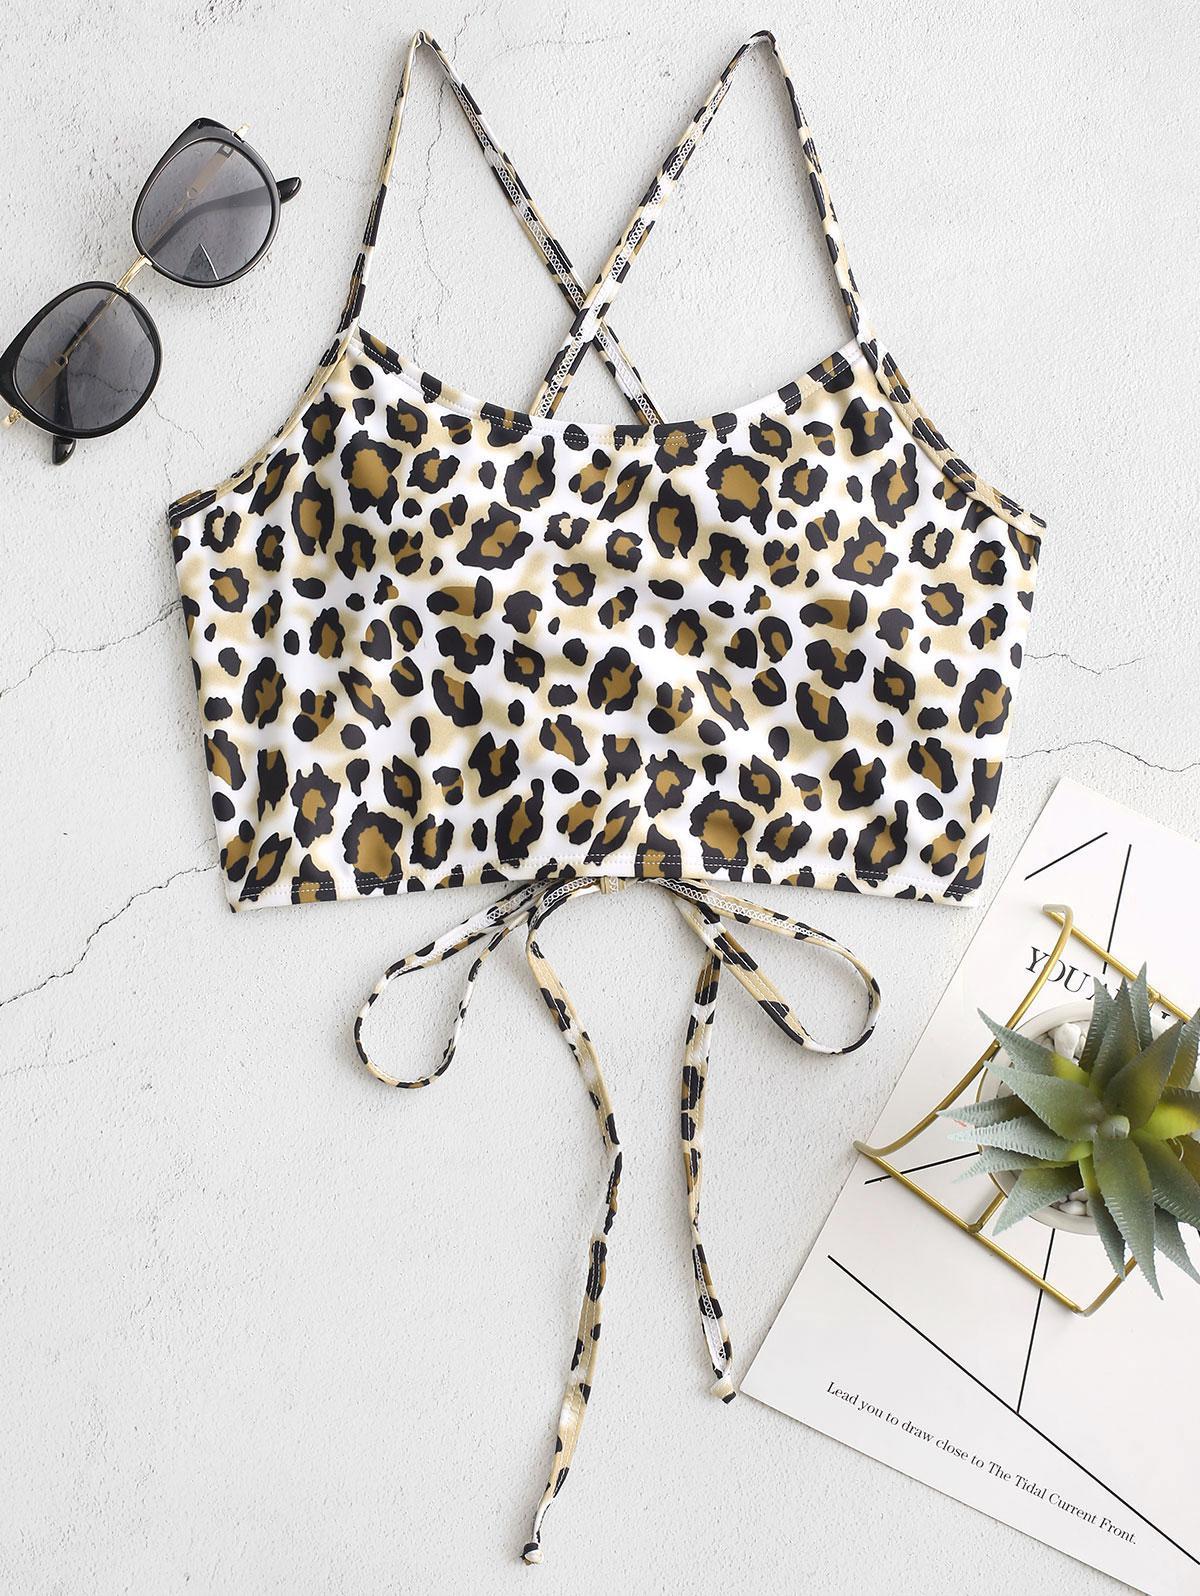 ZAFUL Crisscross Lace-up Leopard Bikini Top фото